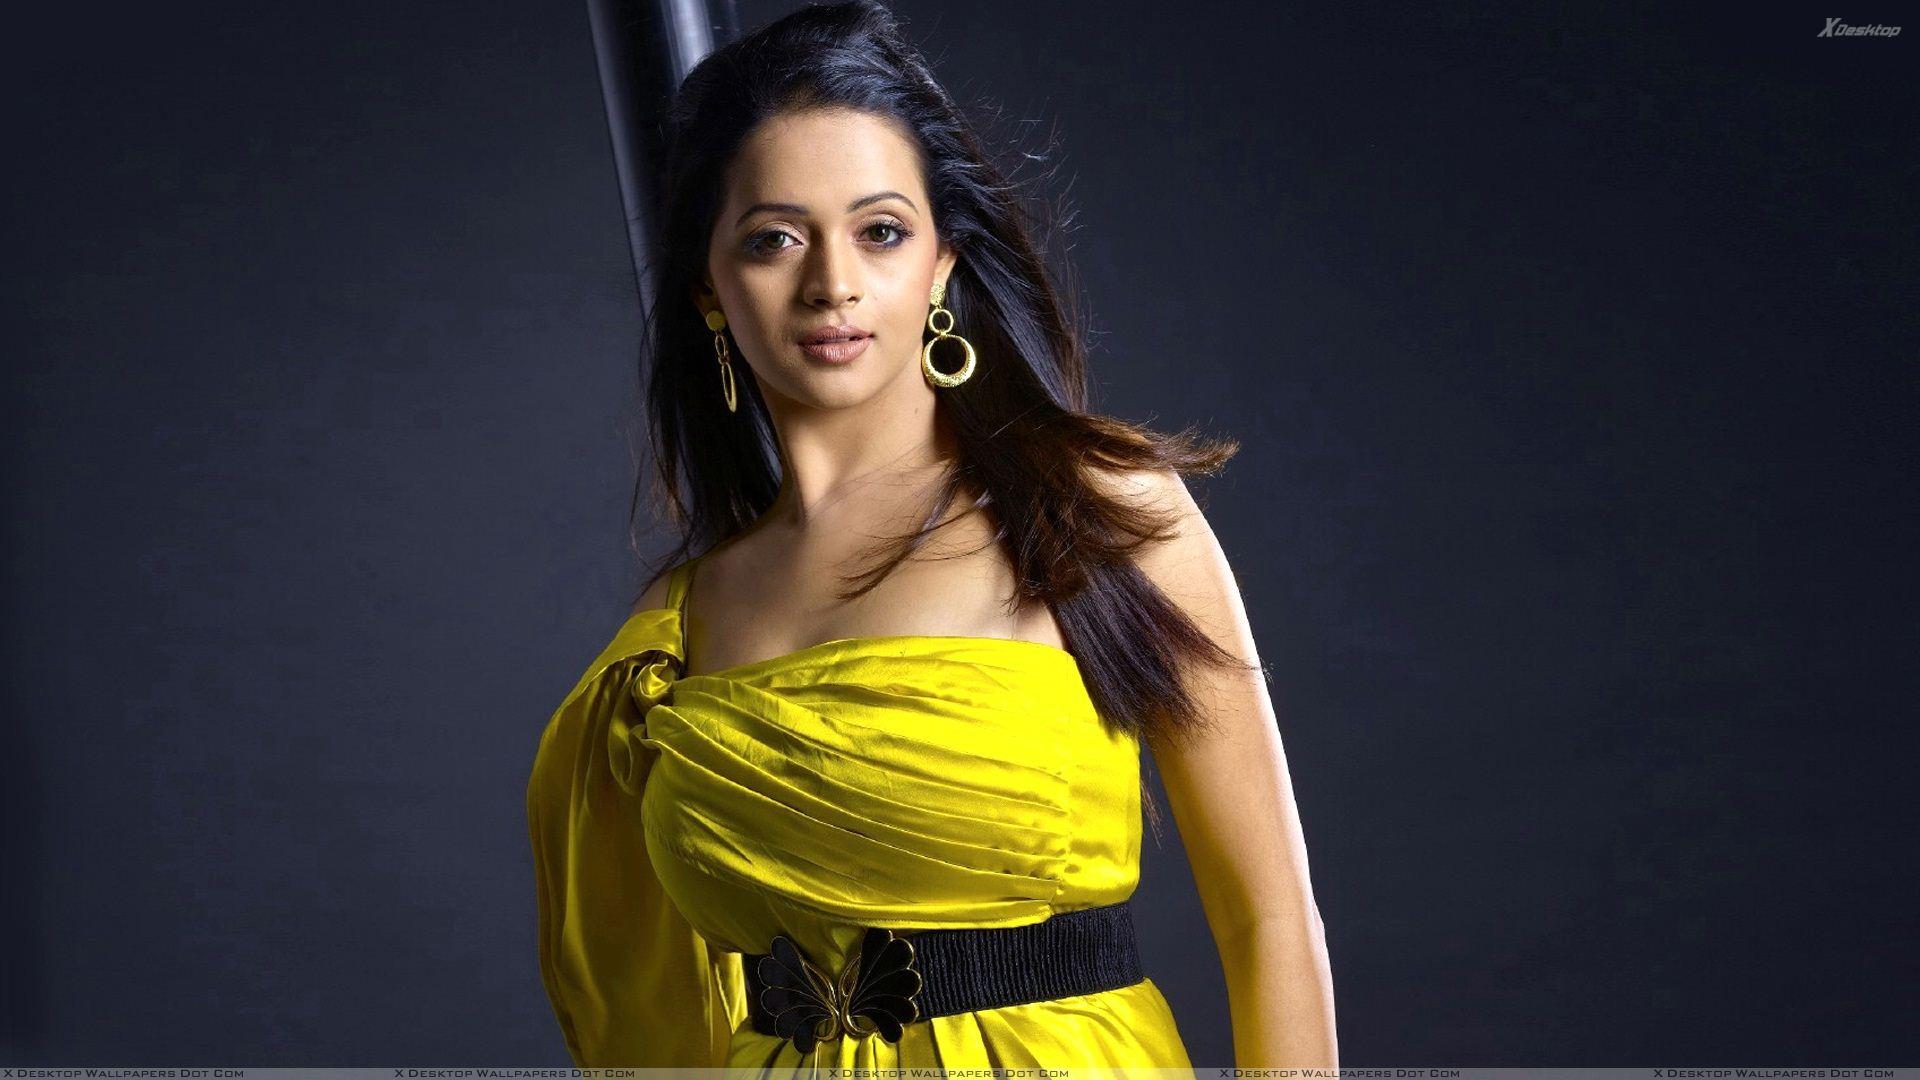 Bhavana In Yellow Dress Beautiful Looking Photoshoot Wallpaper 1920x1080